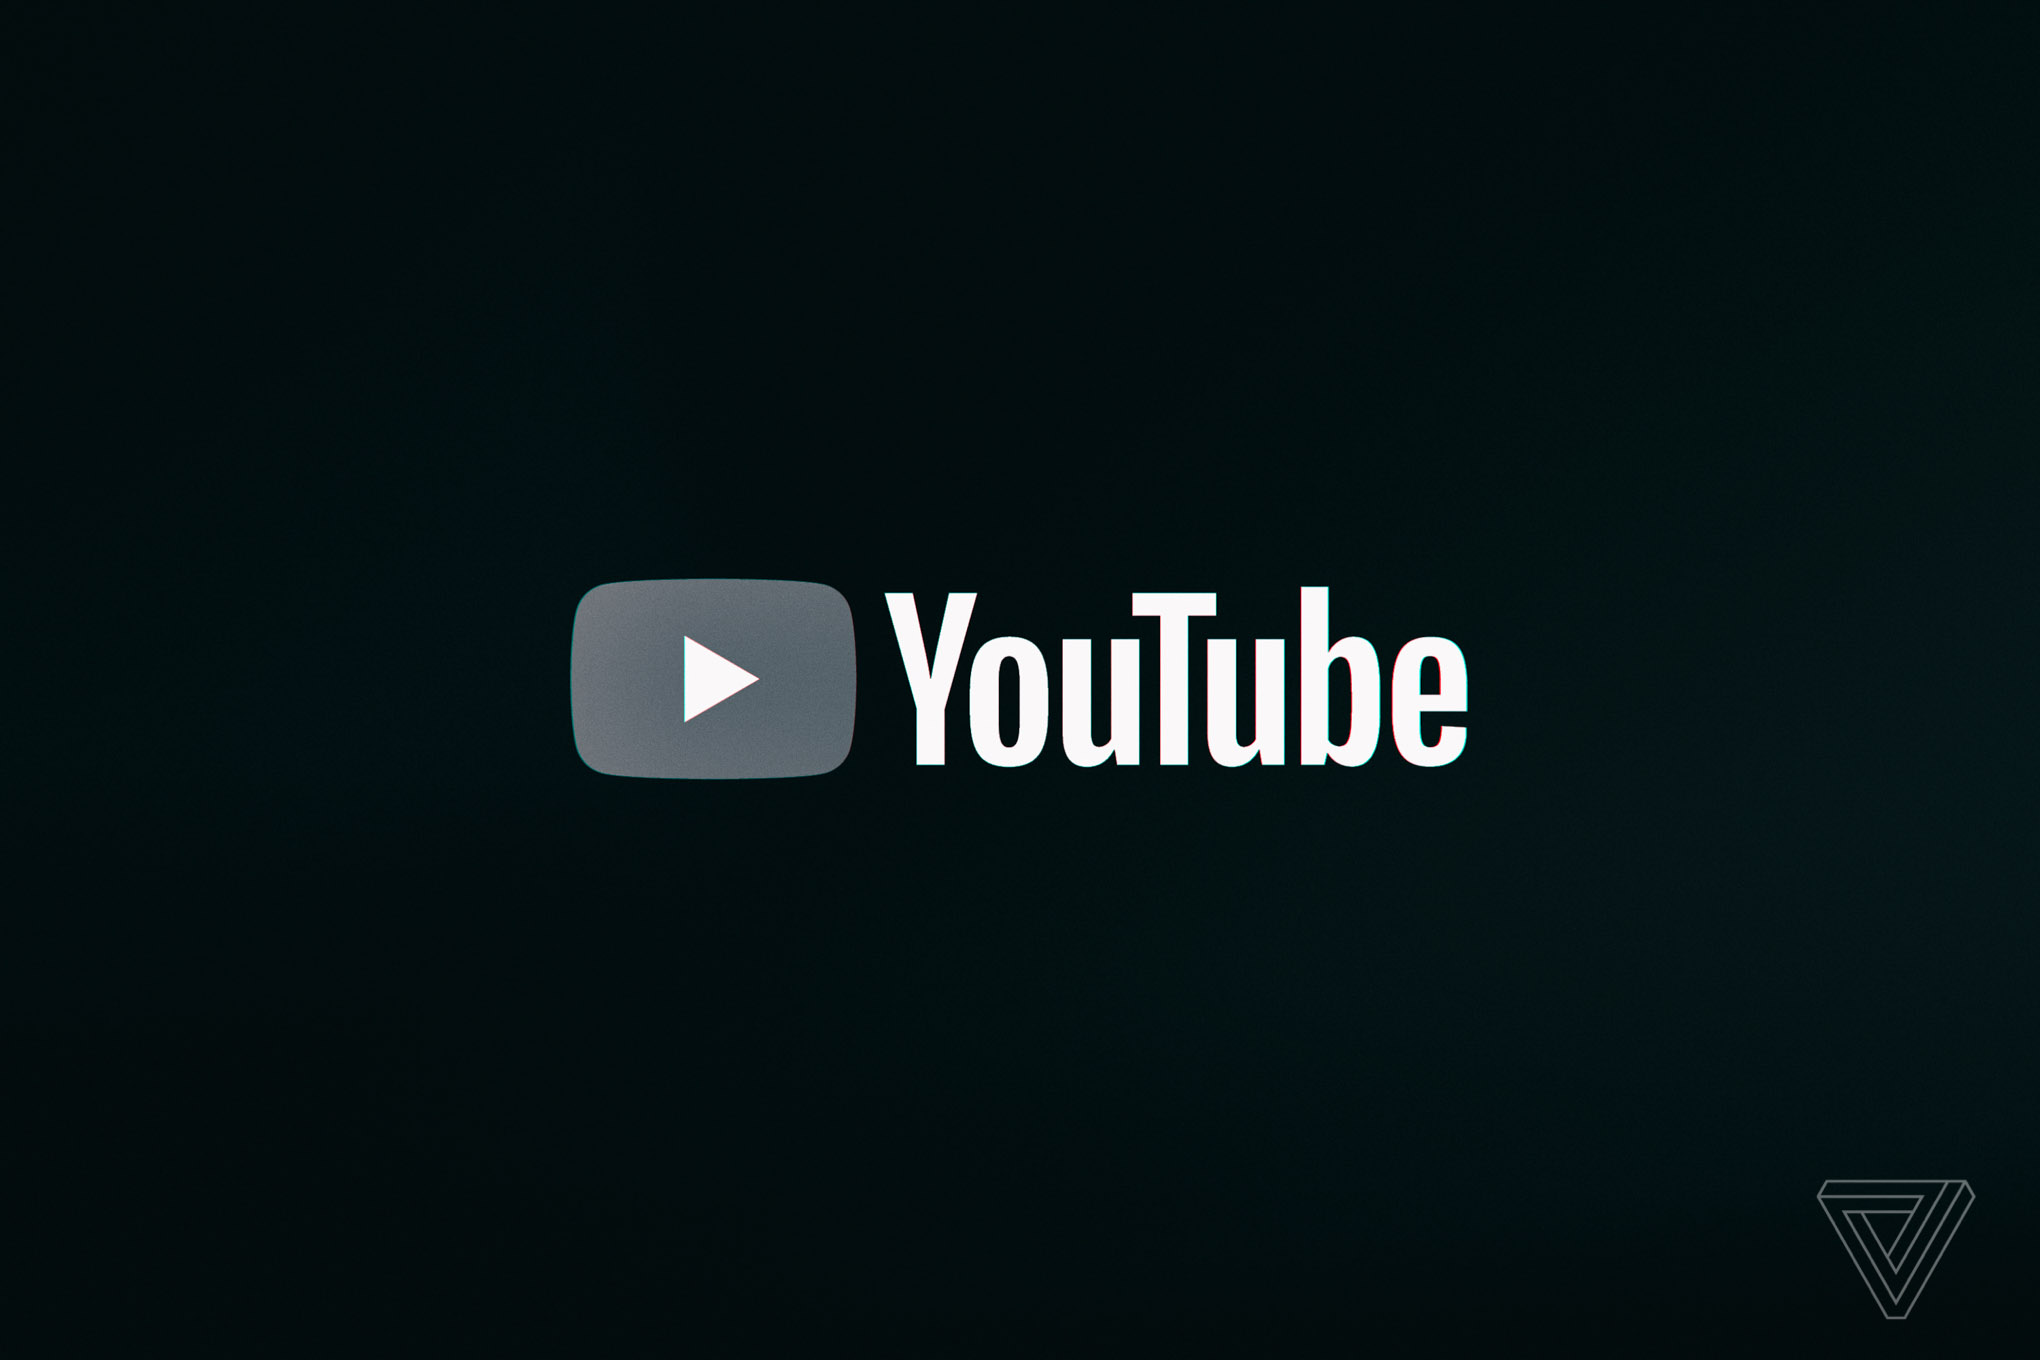 YouTube - The Verge